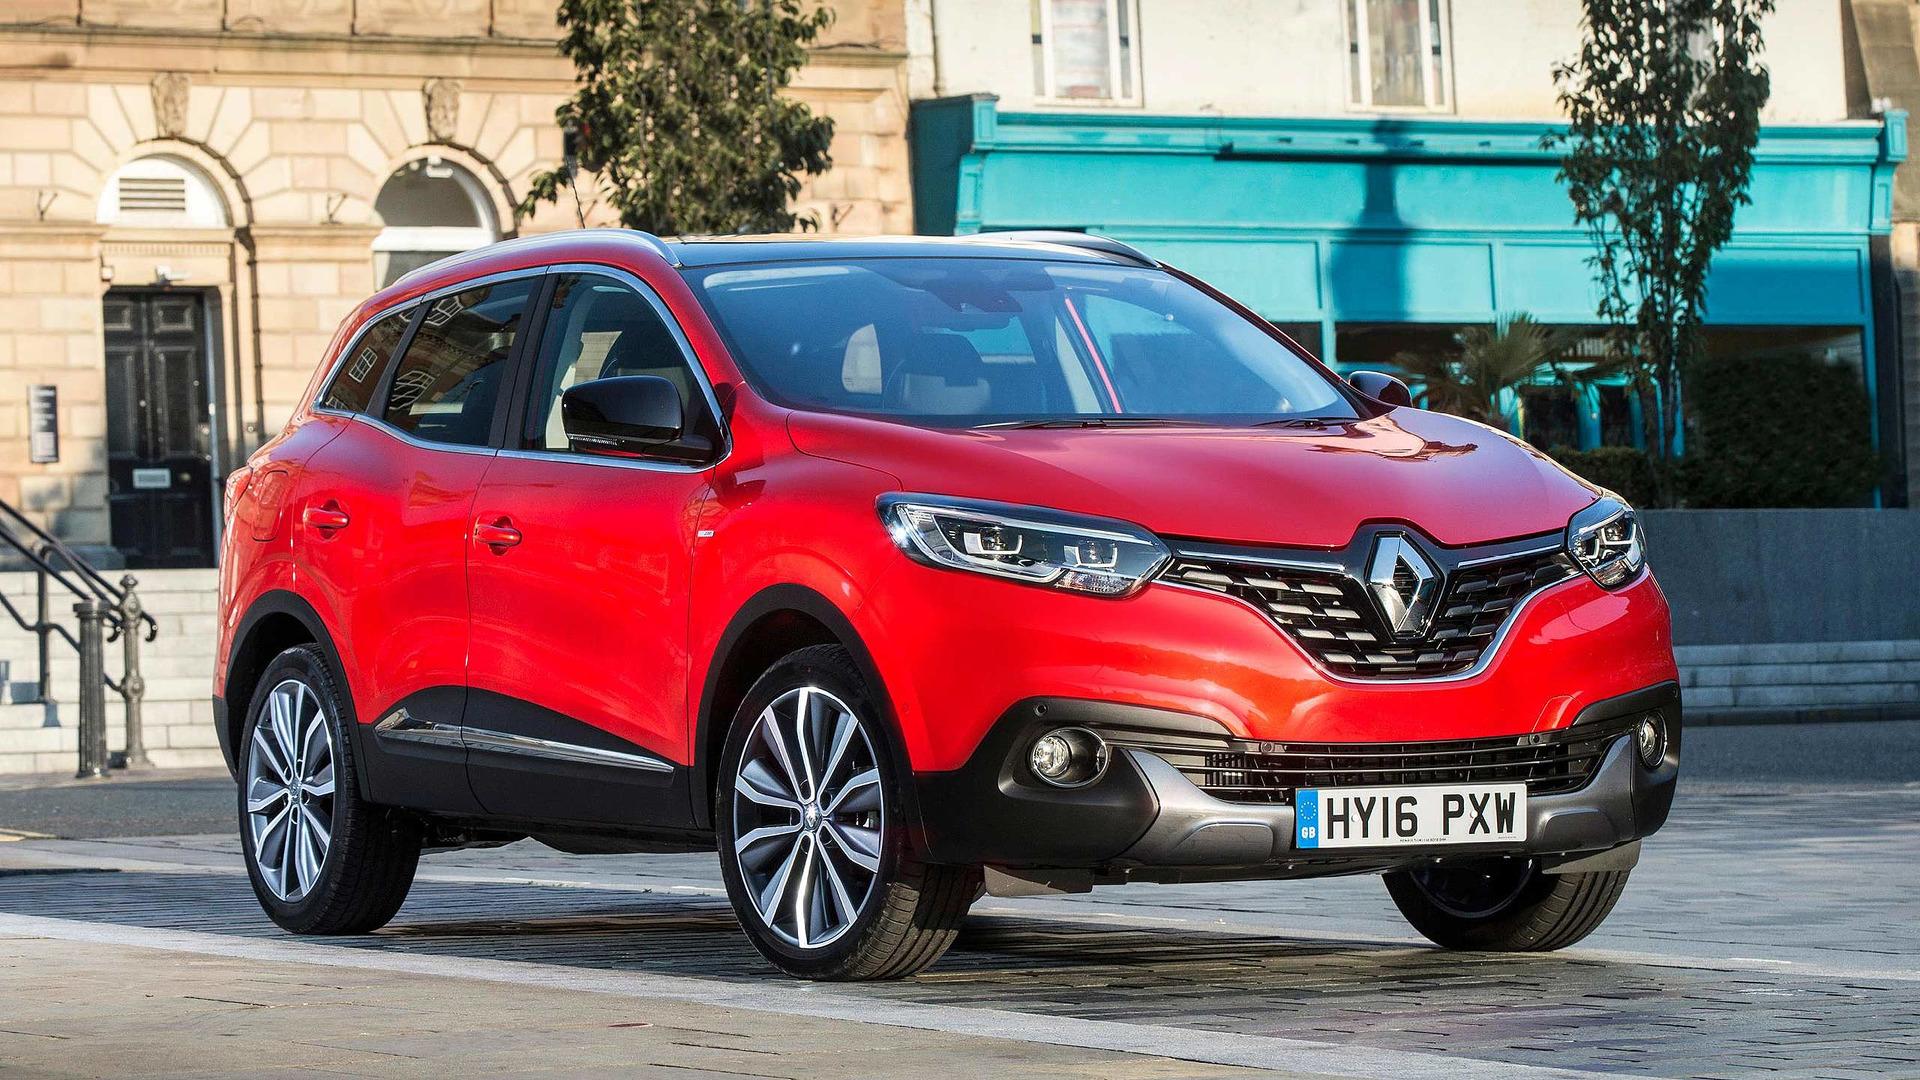 Renault Kadjar 2017 >> 2015 Renault Kadjar Review Practical Likeable And Good Value